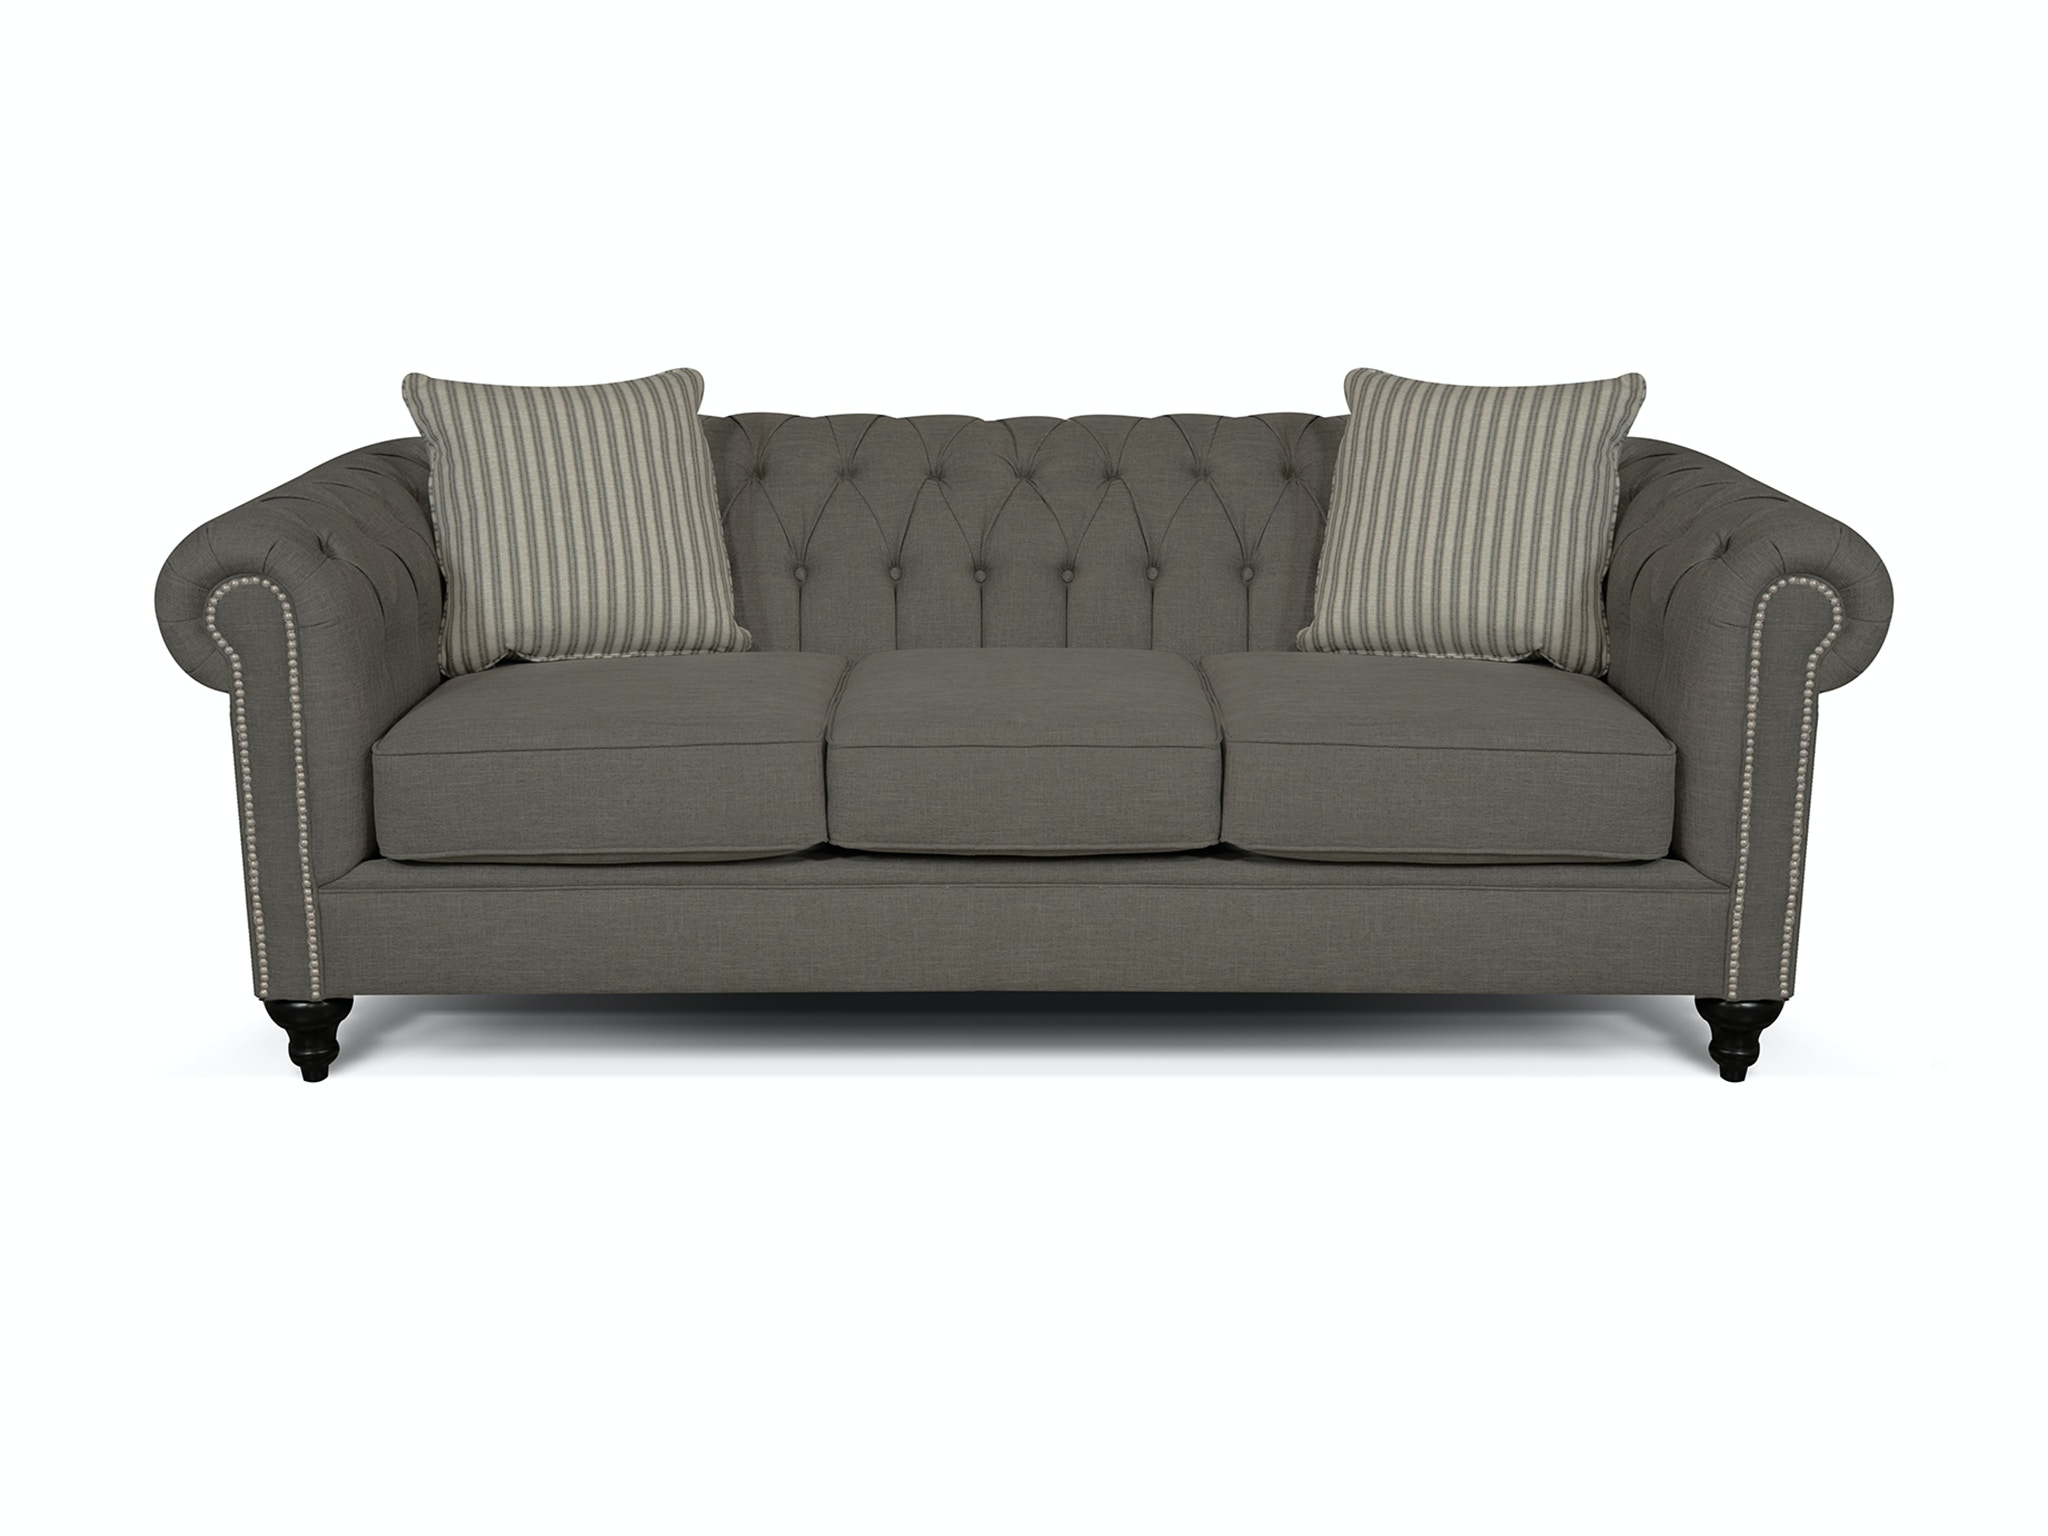 england living room brooks sofa with nails 4h05n england furniture rh englandfurniture com england furniture sofa beds england furniture sofa sleeper